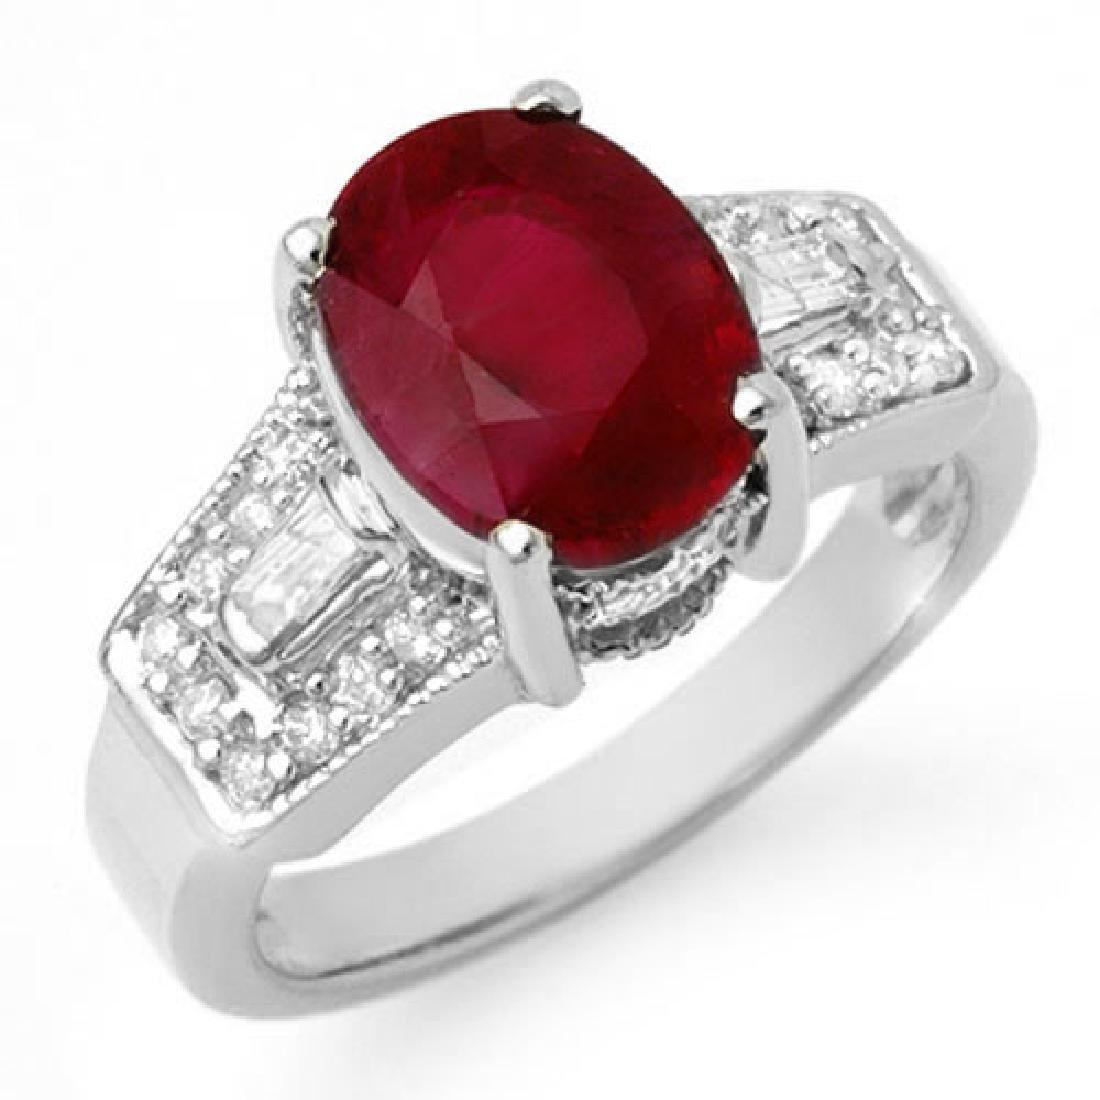 5.55 CTW Ruby & Diamond Ring 14K White Gold